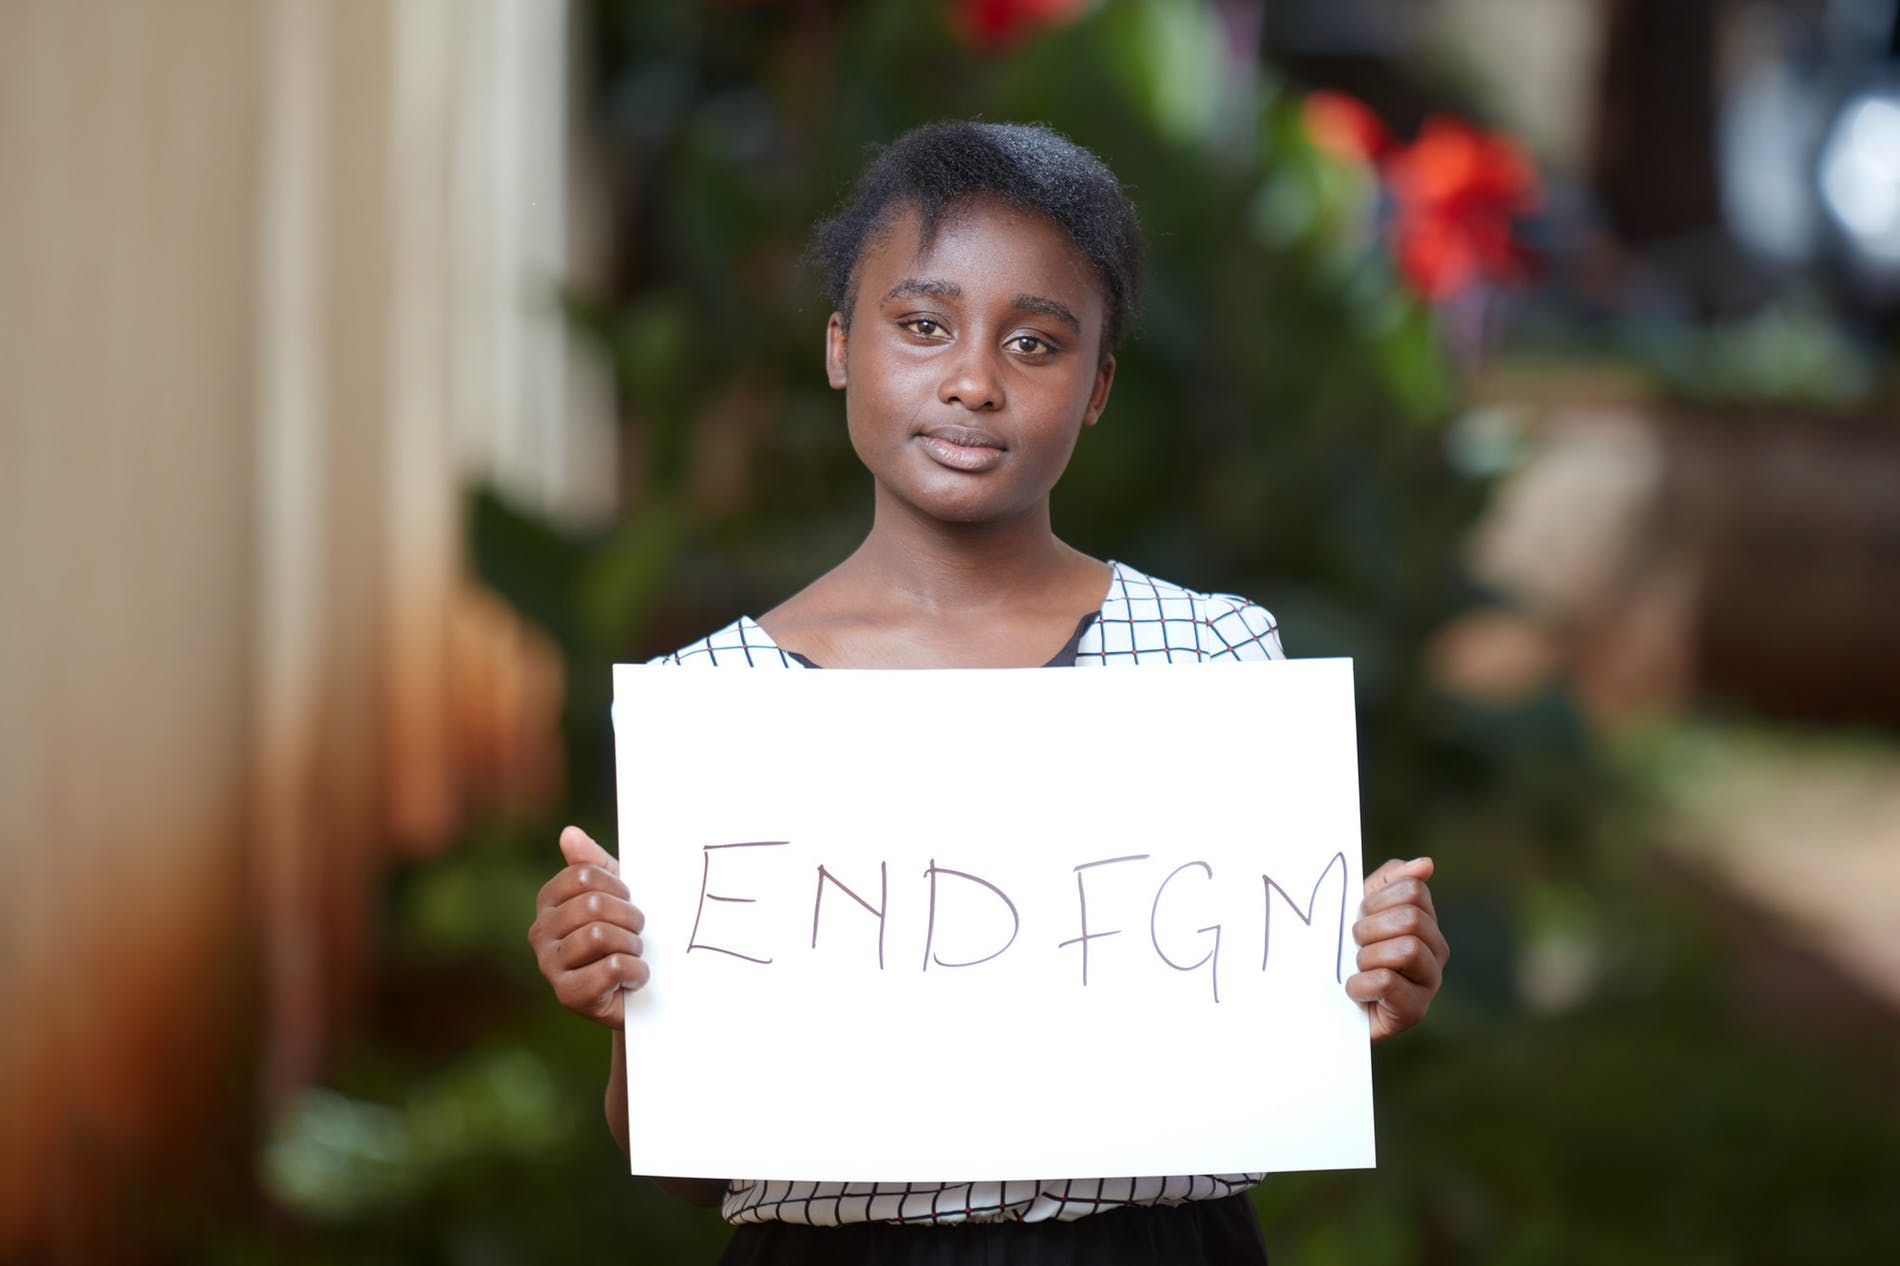 meisjesbesnijdenis zero tolerance day